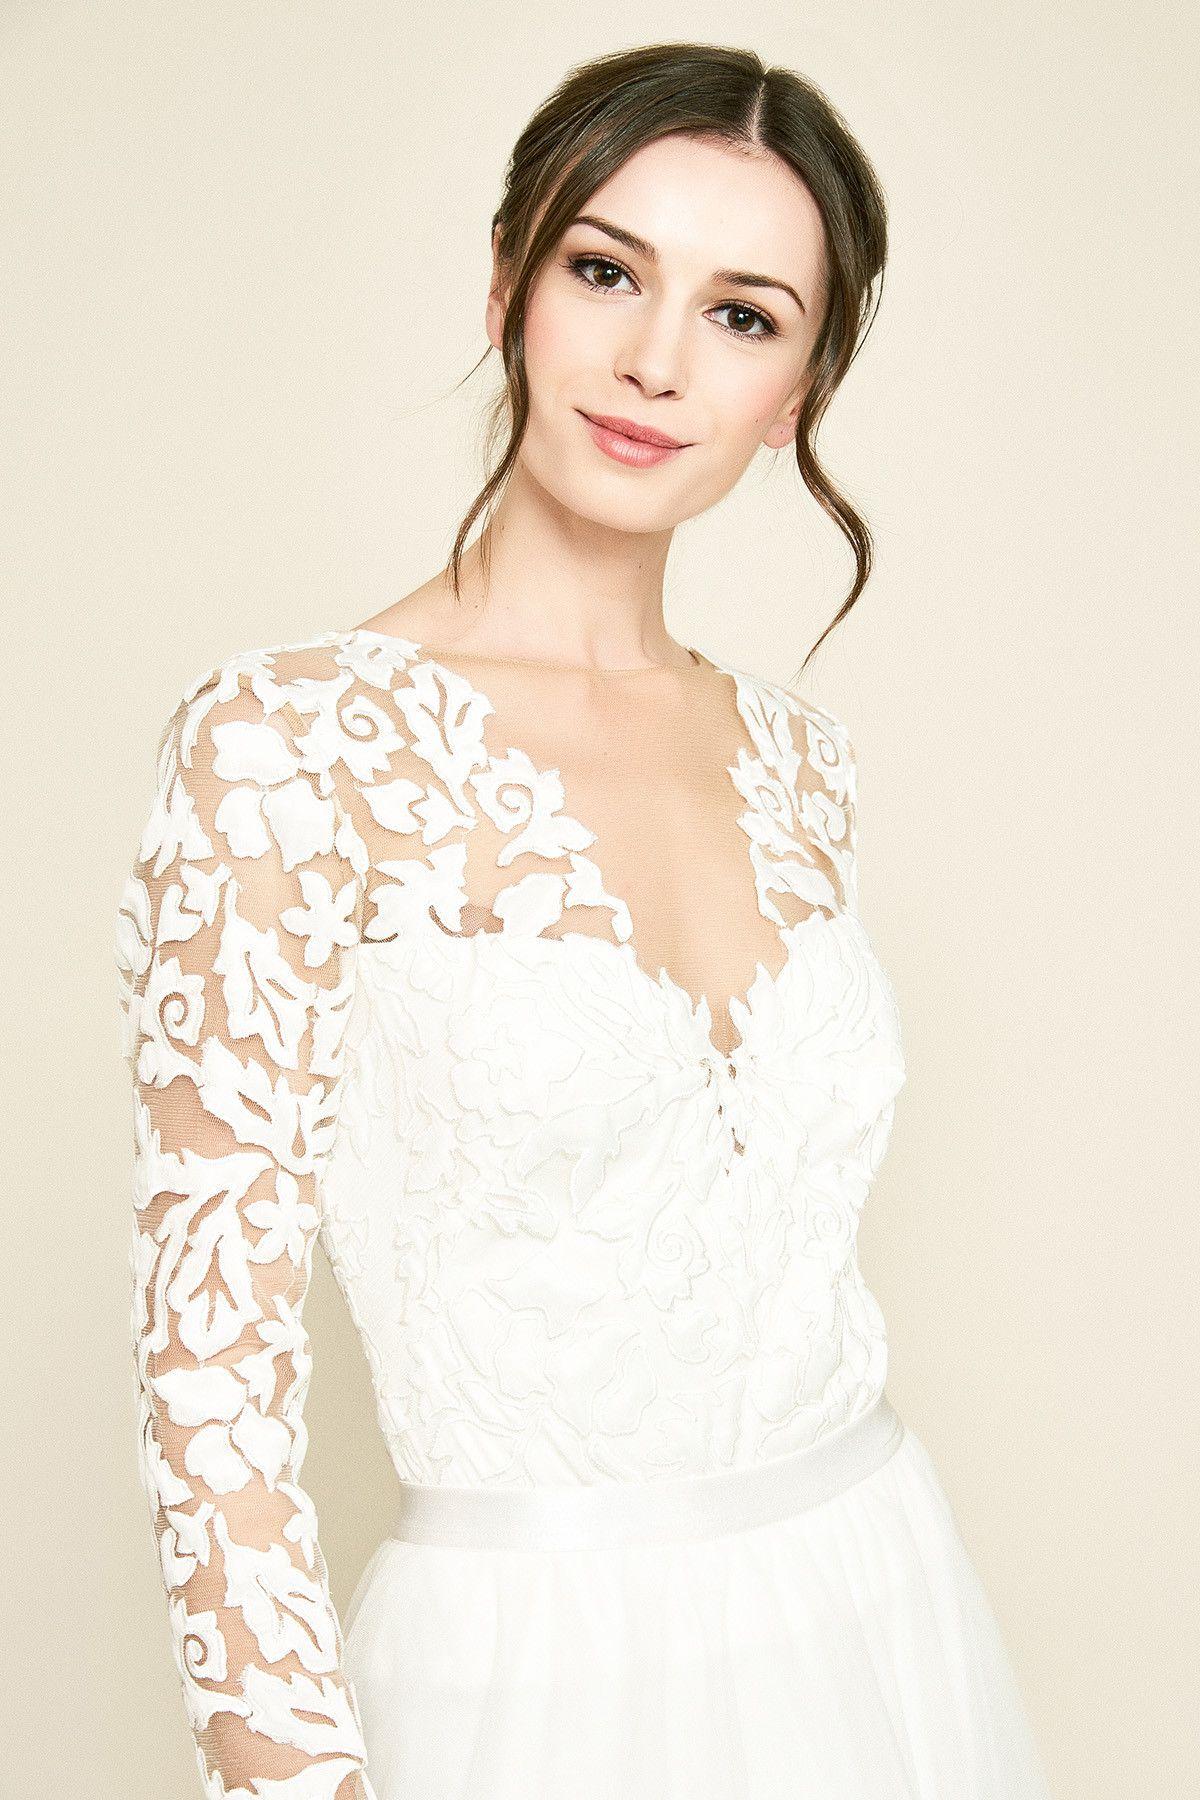 33+ Sleeve bodysuit wedding dress ideas in 2021